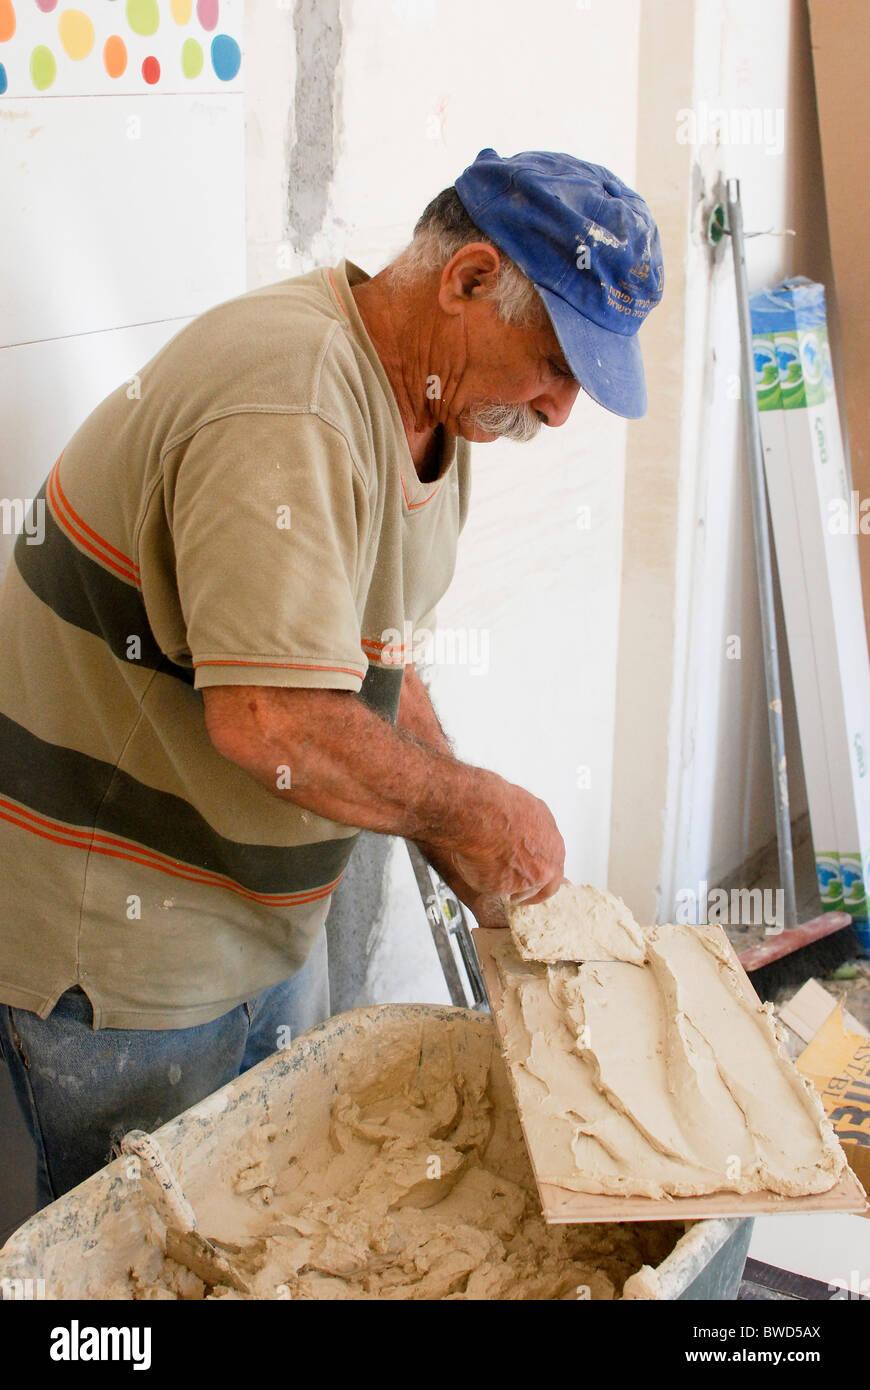 skilled Tiler at work - Stock Image